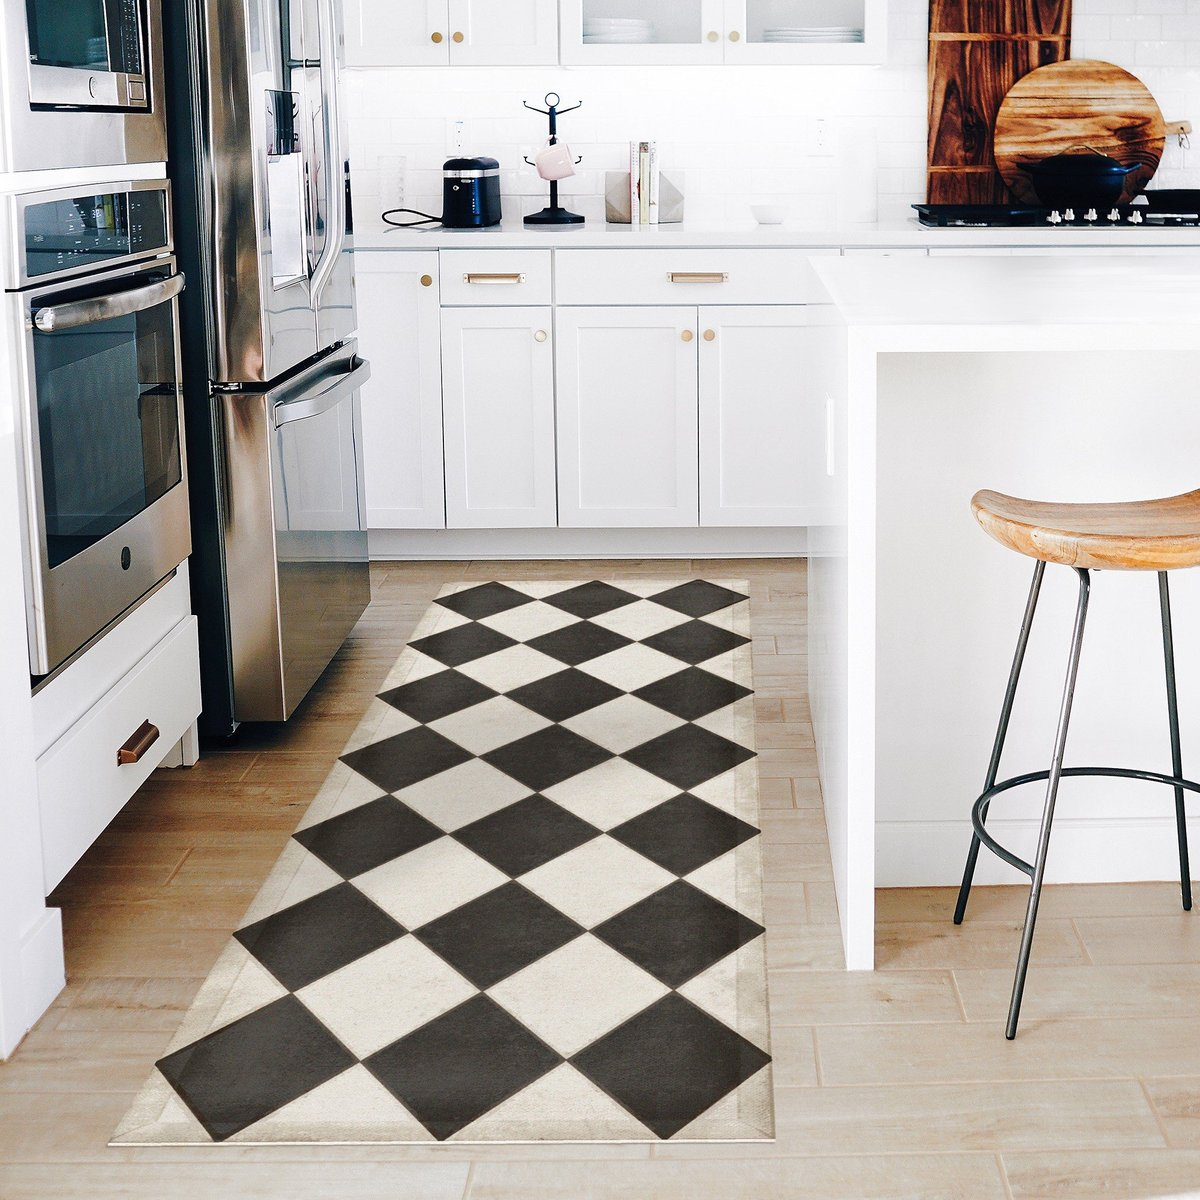 Kitchen Rug Decor Ideas